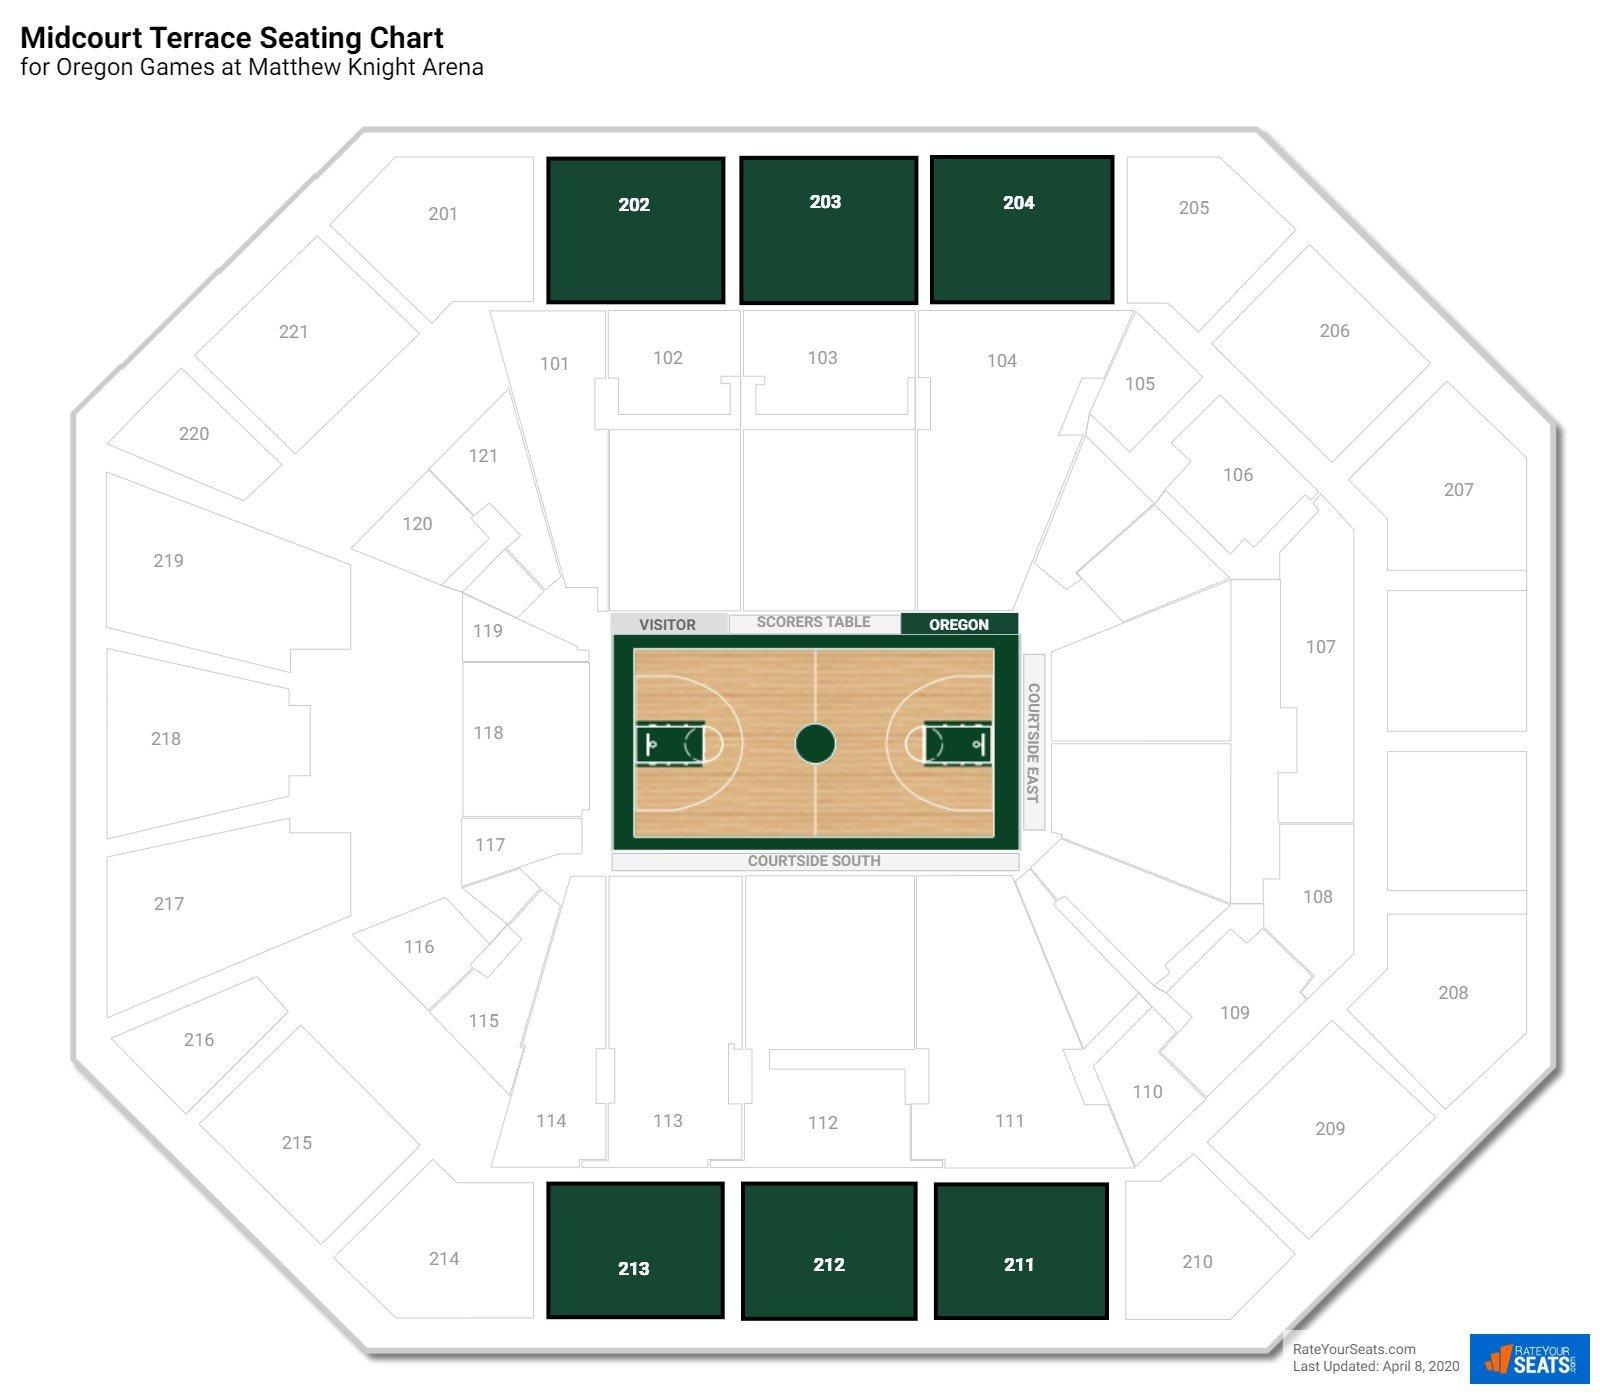 Matthew Knight Arena Midcourt Terrace Seating Chart